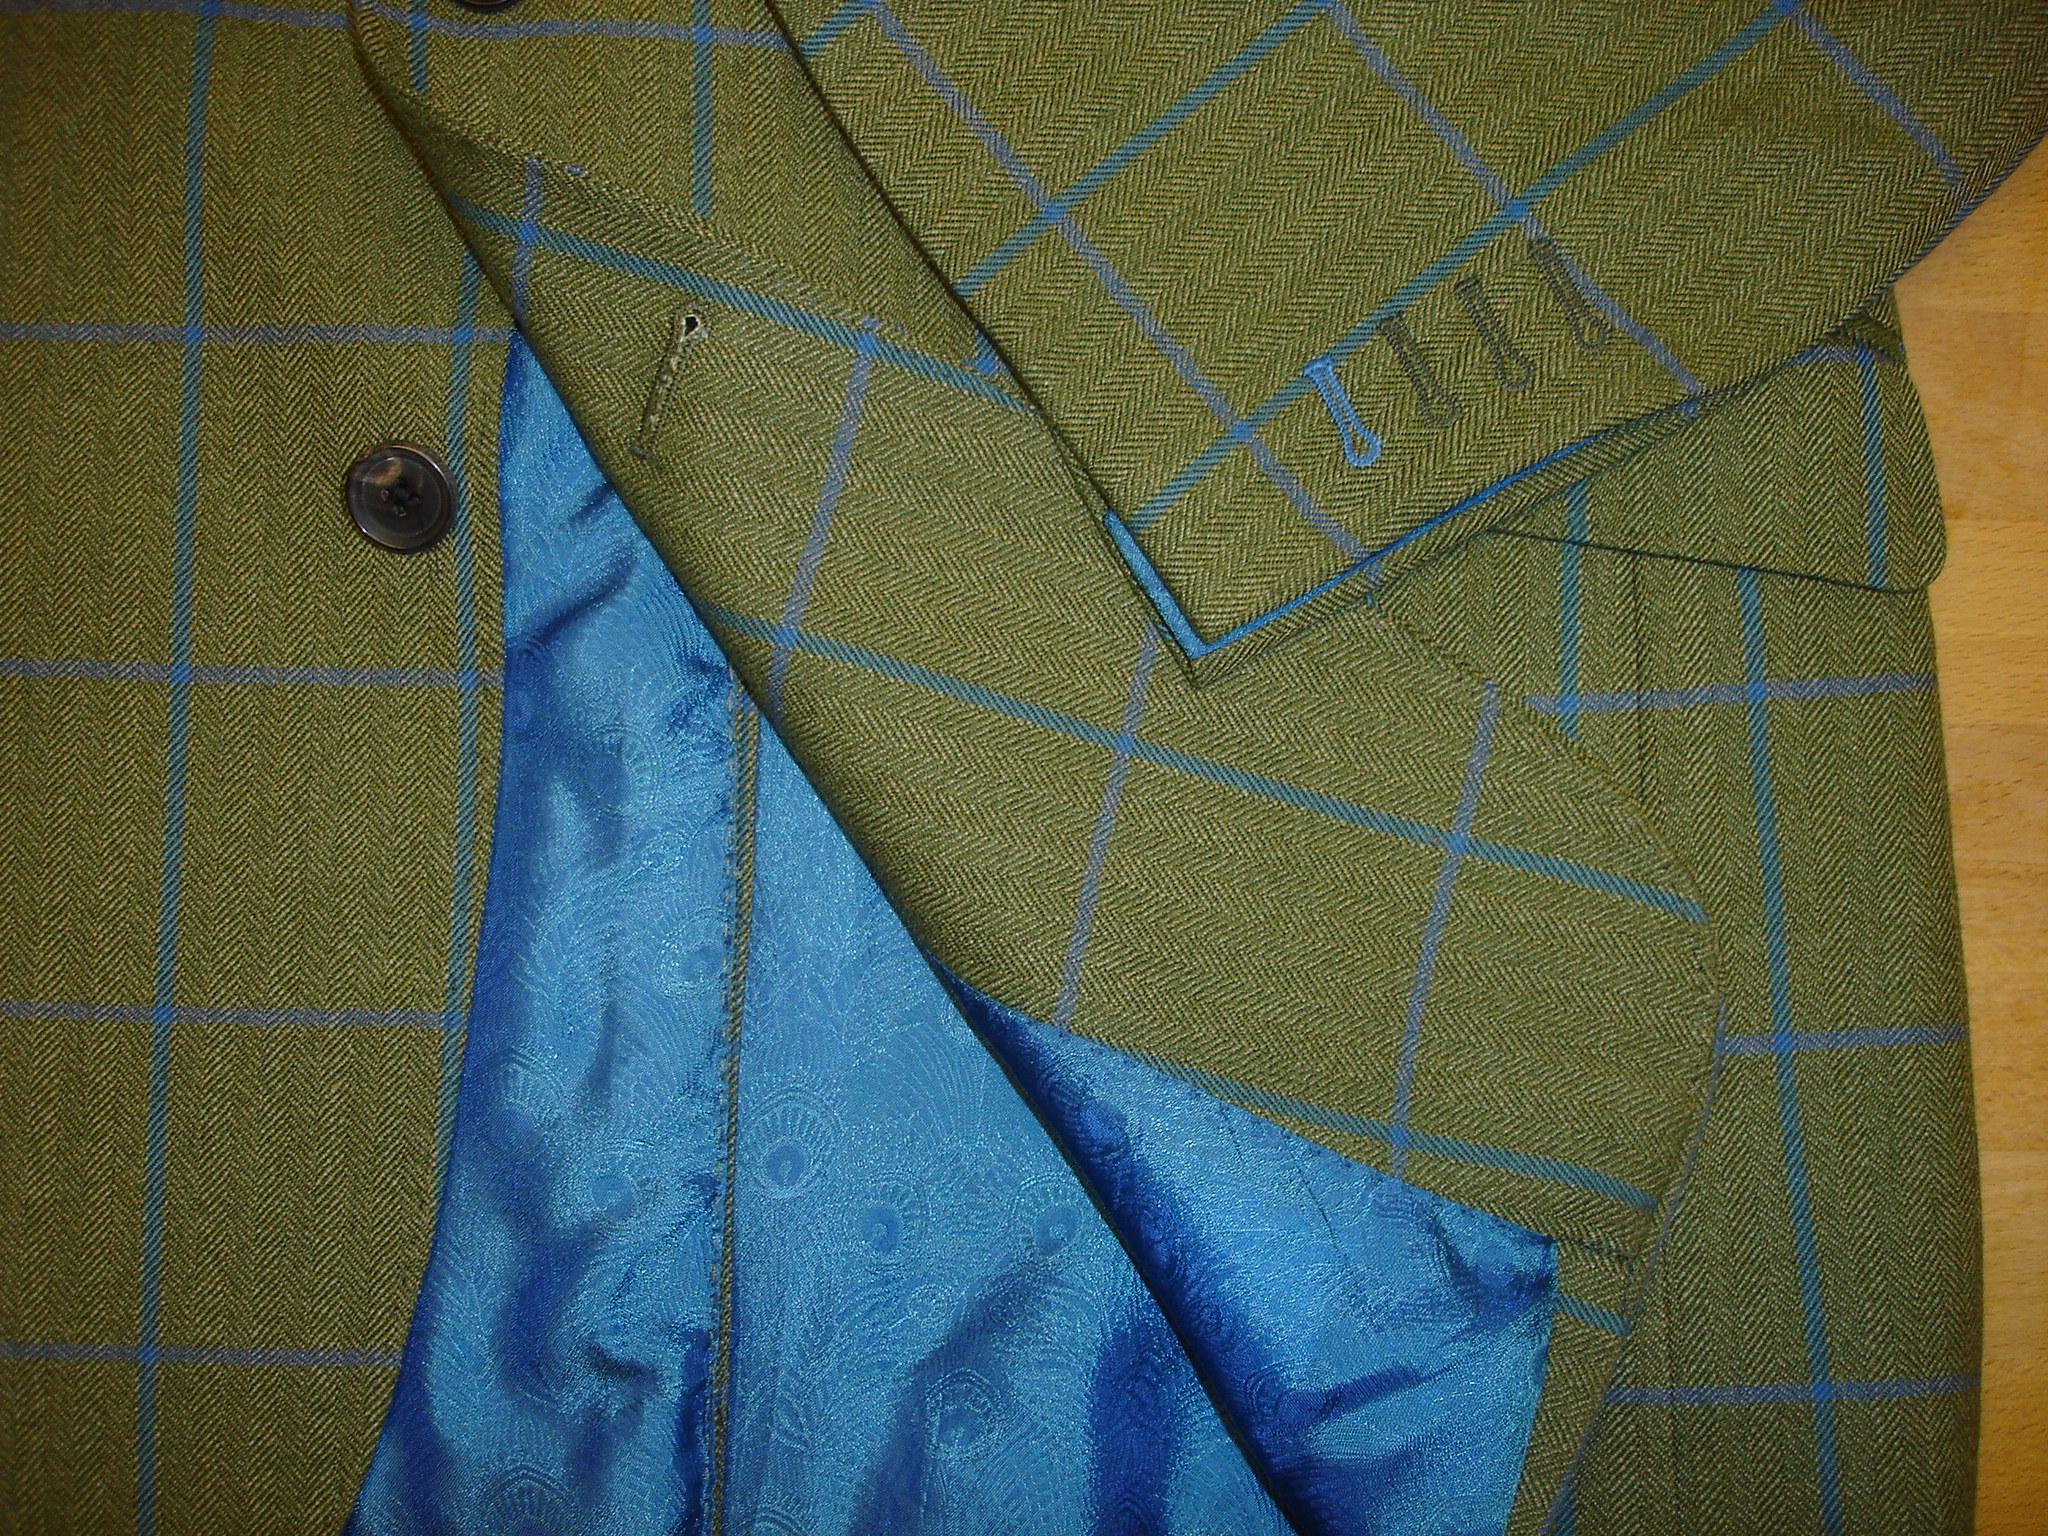 Worsted Alsport Tweed Jacket 5.JPG